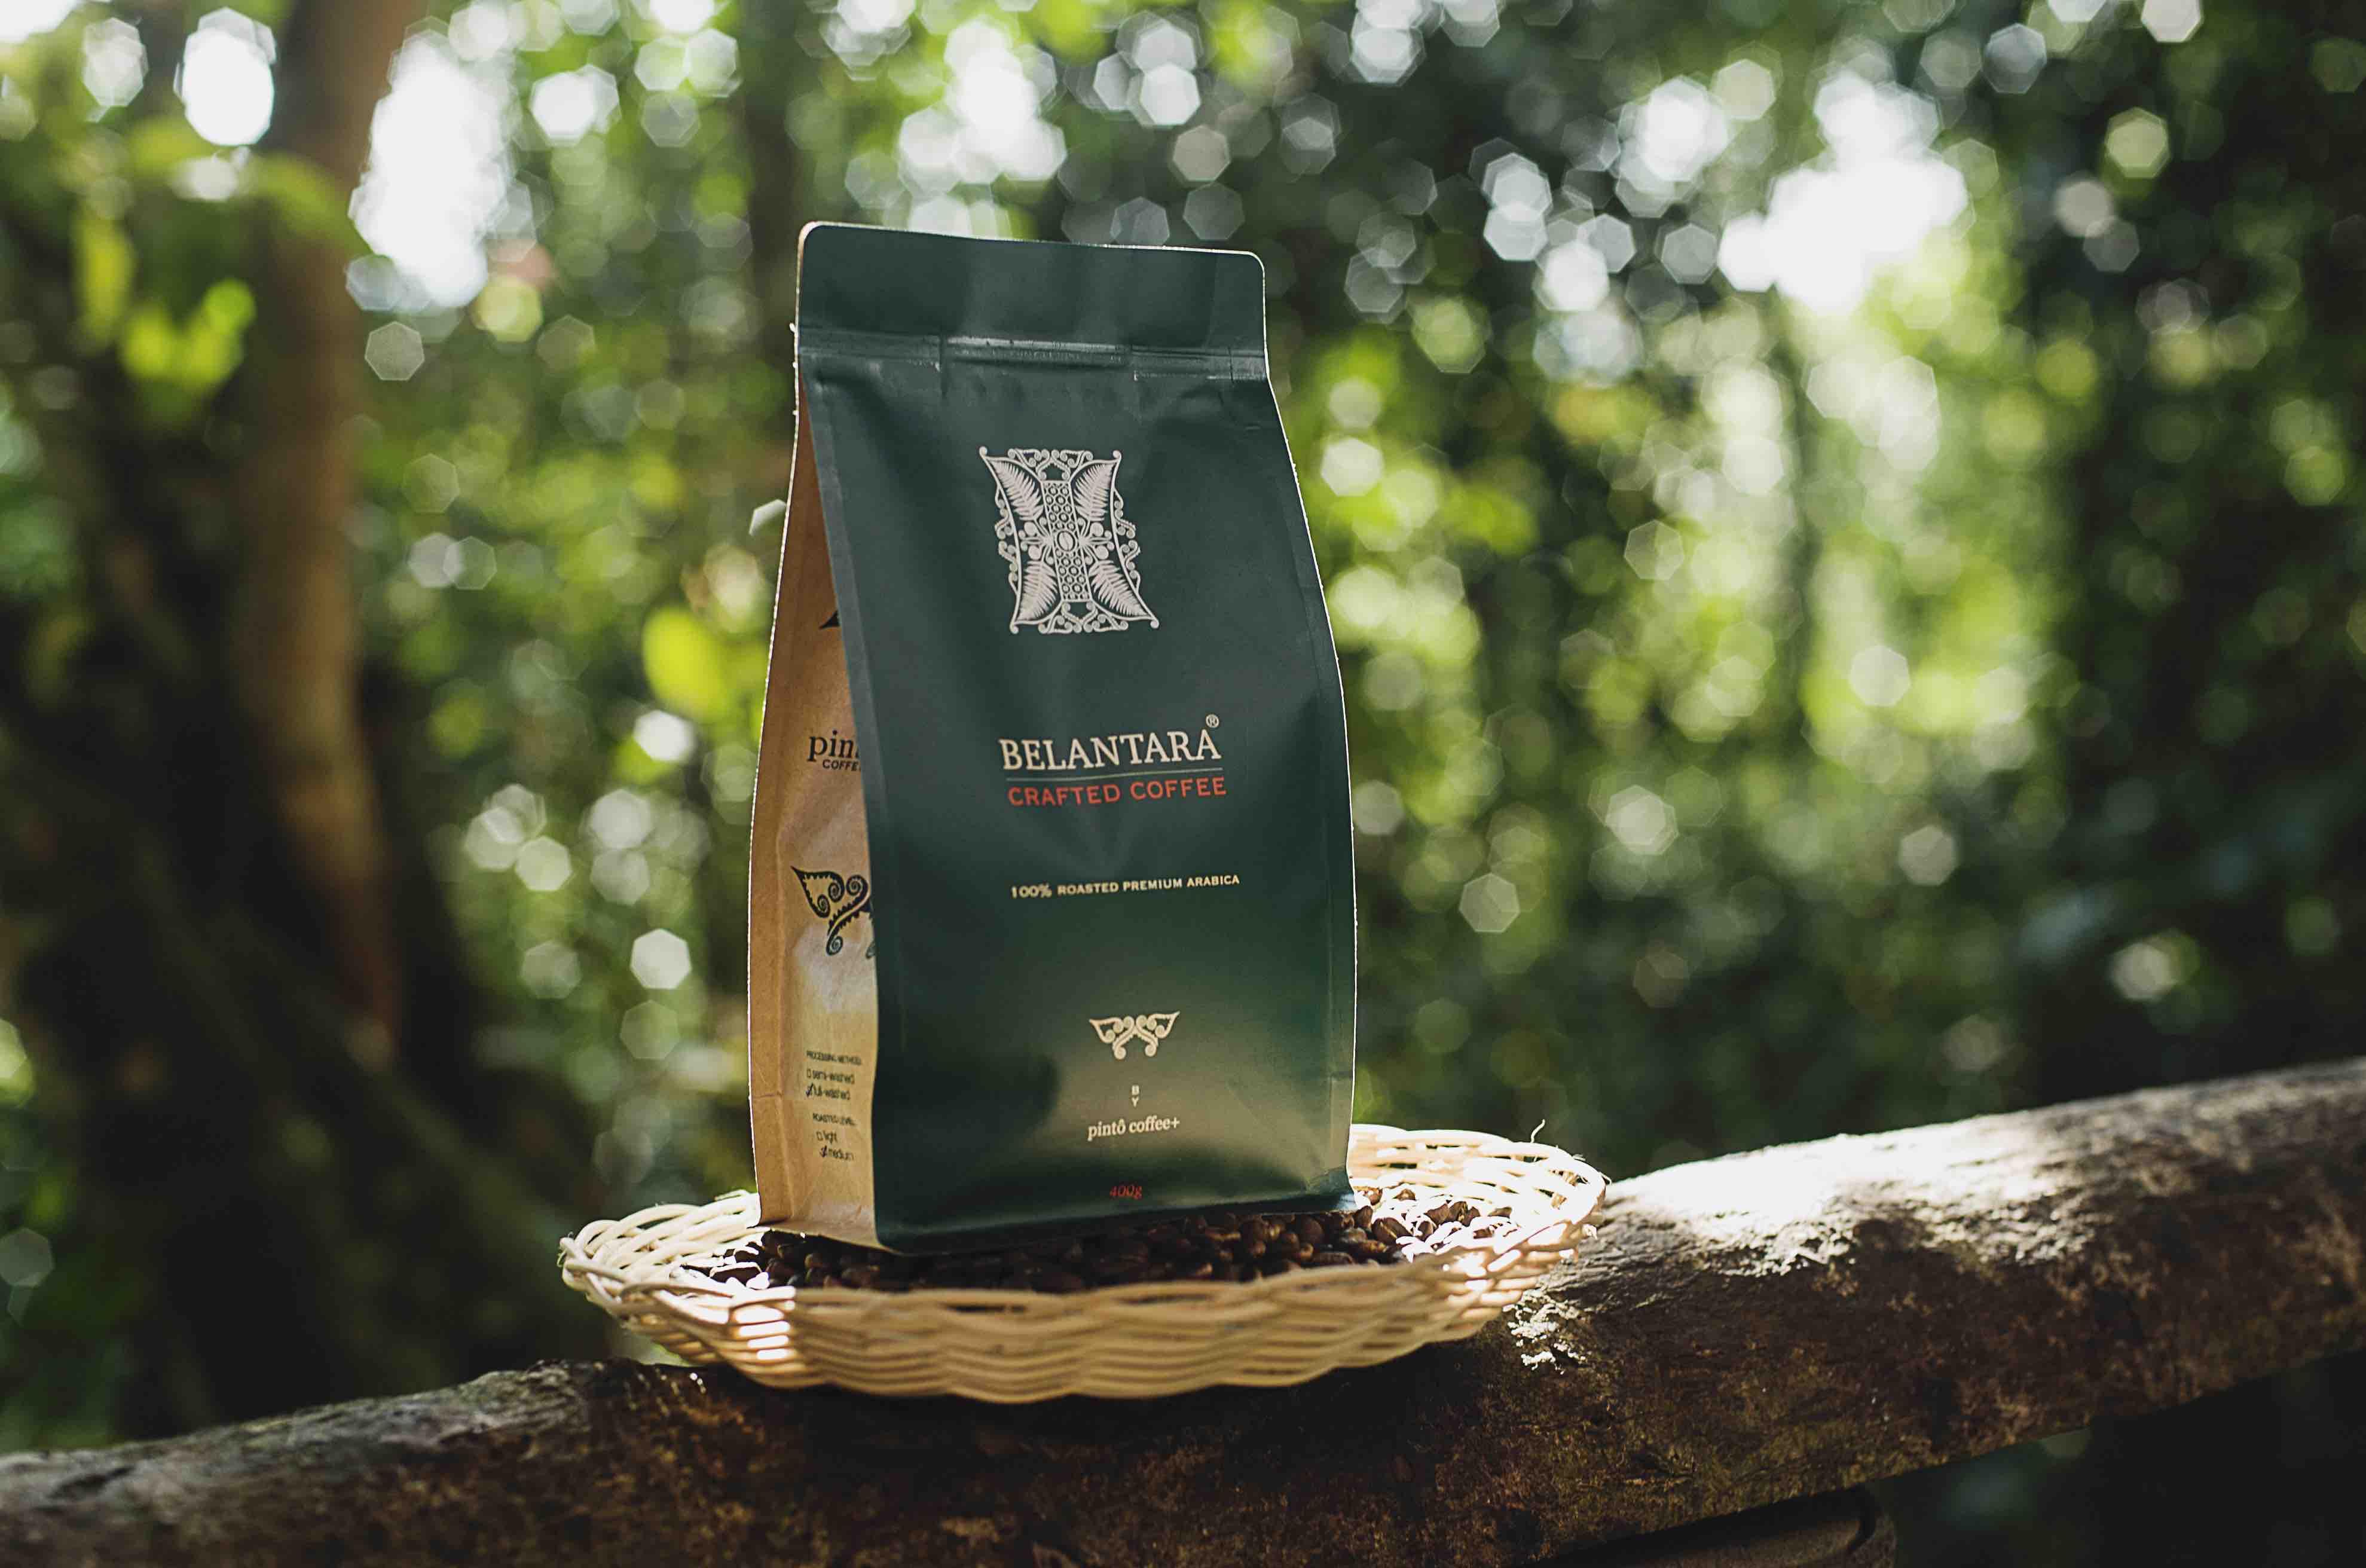 BELANTARA - Crafted Coffee